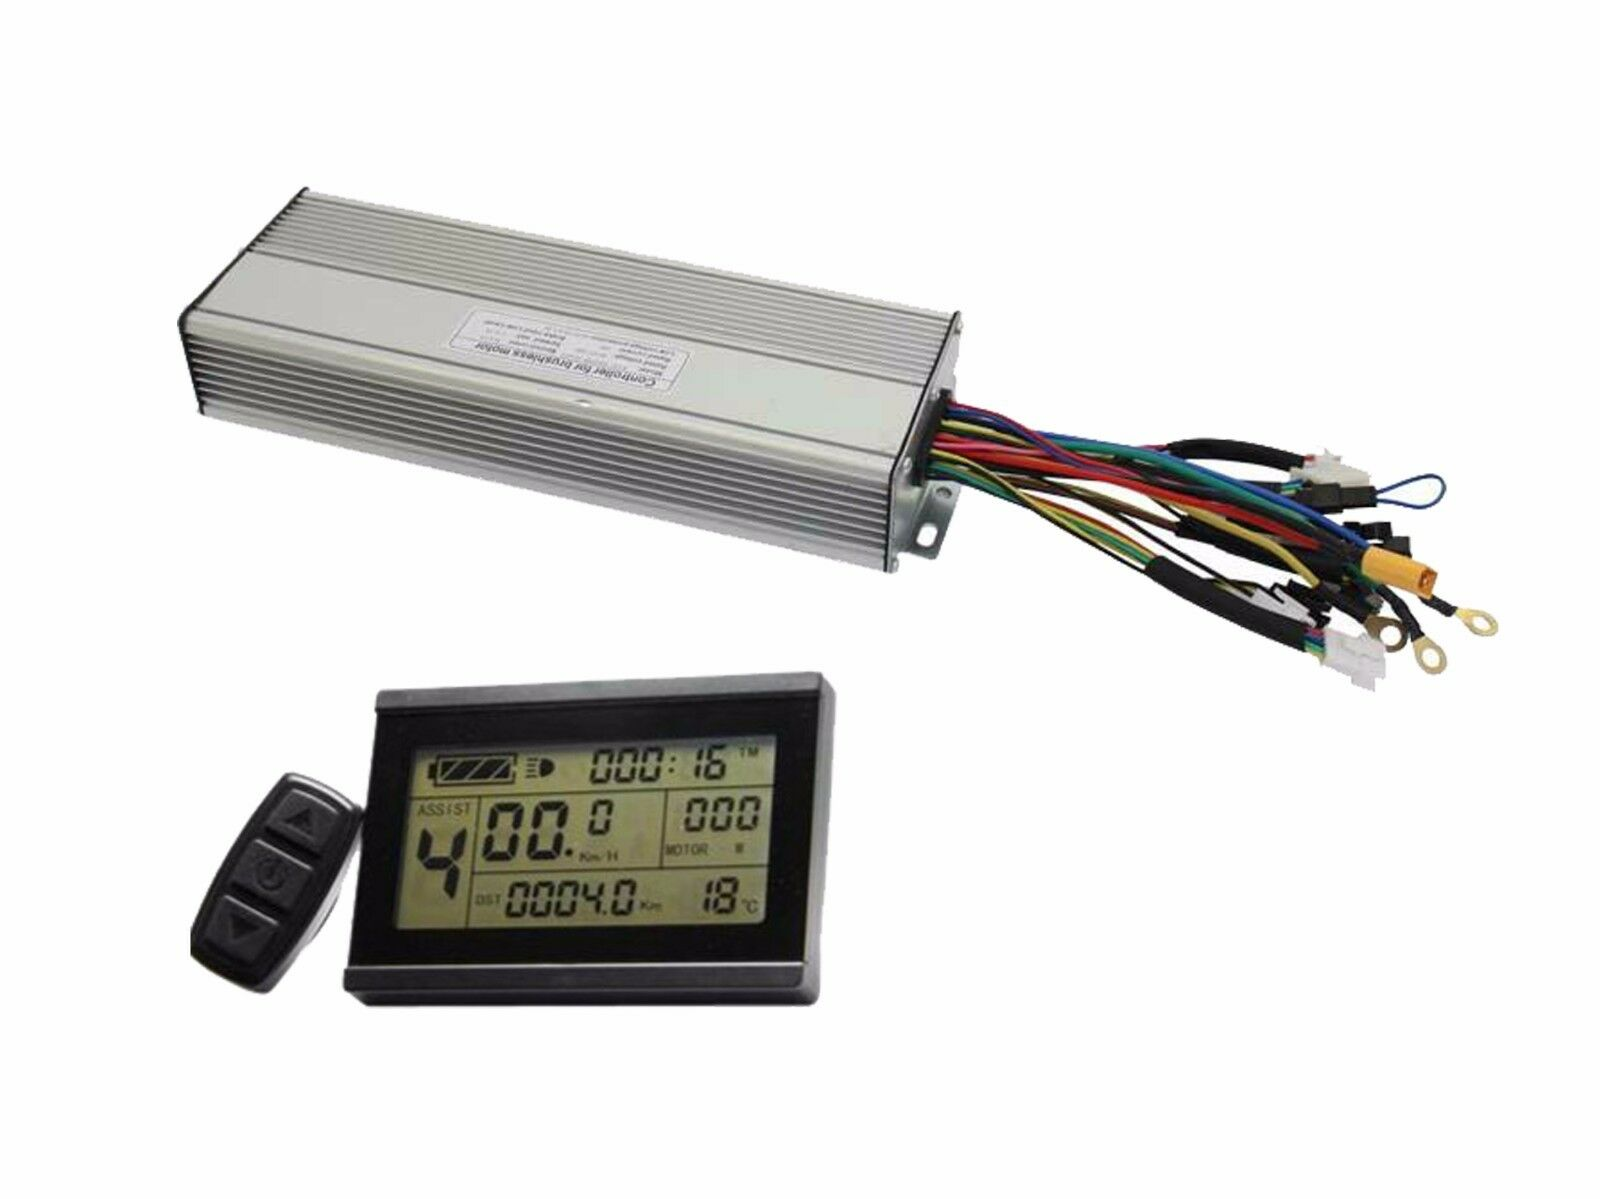 EU DUTY FREE 36V 48V LCD3 Panel + Ebike 1200W Controller 35A